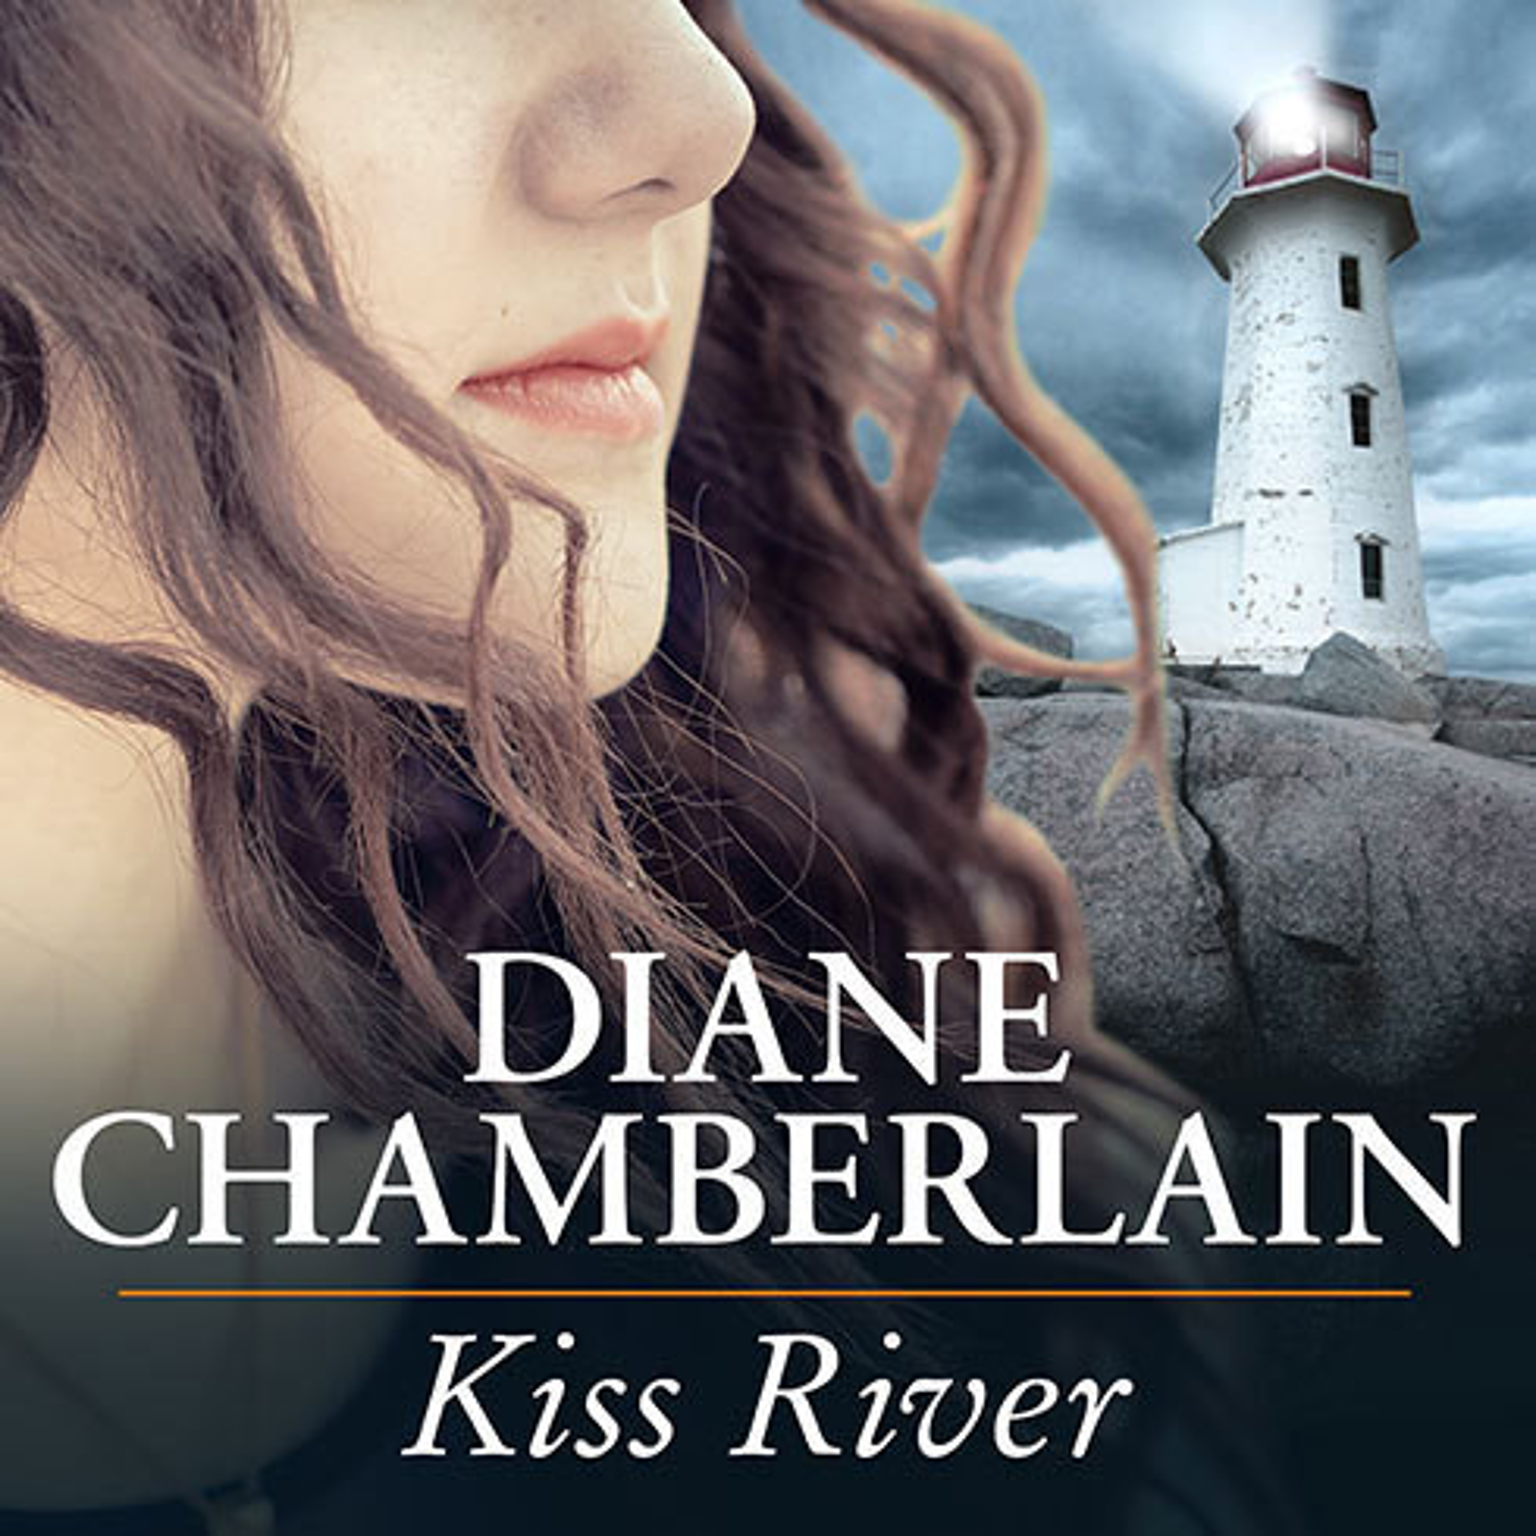 Printable Kiss River Audiobook Cover Art